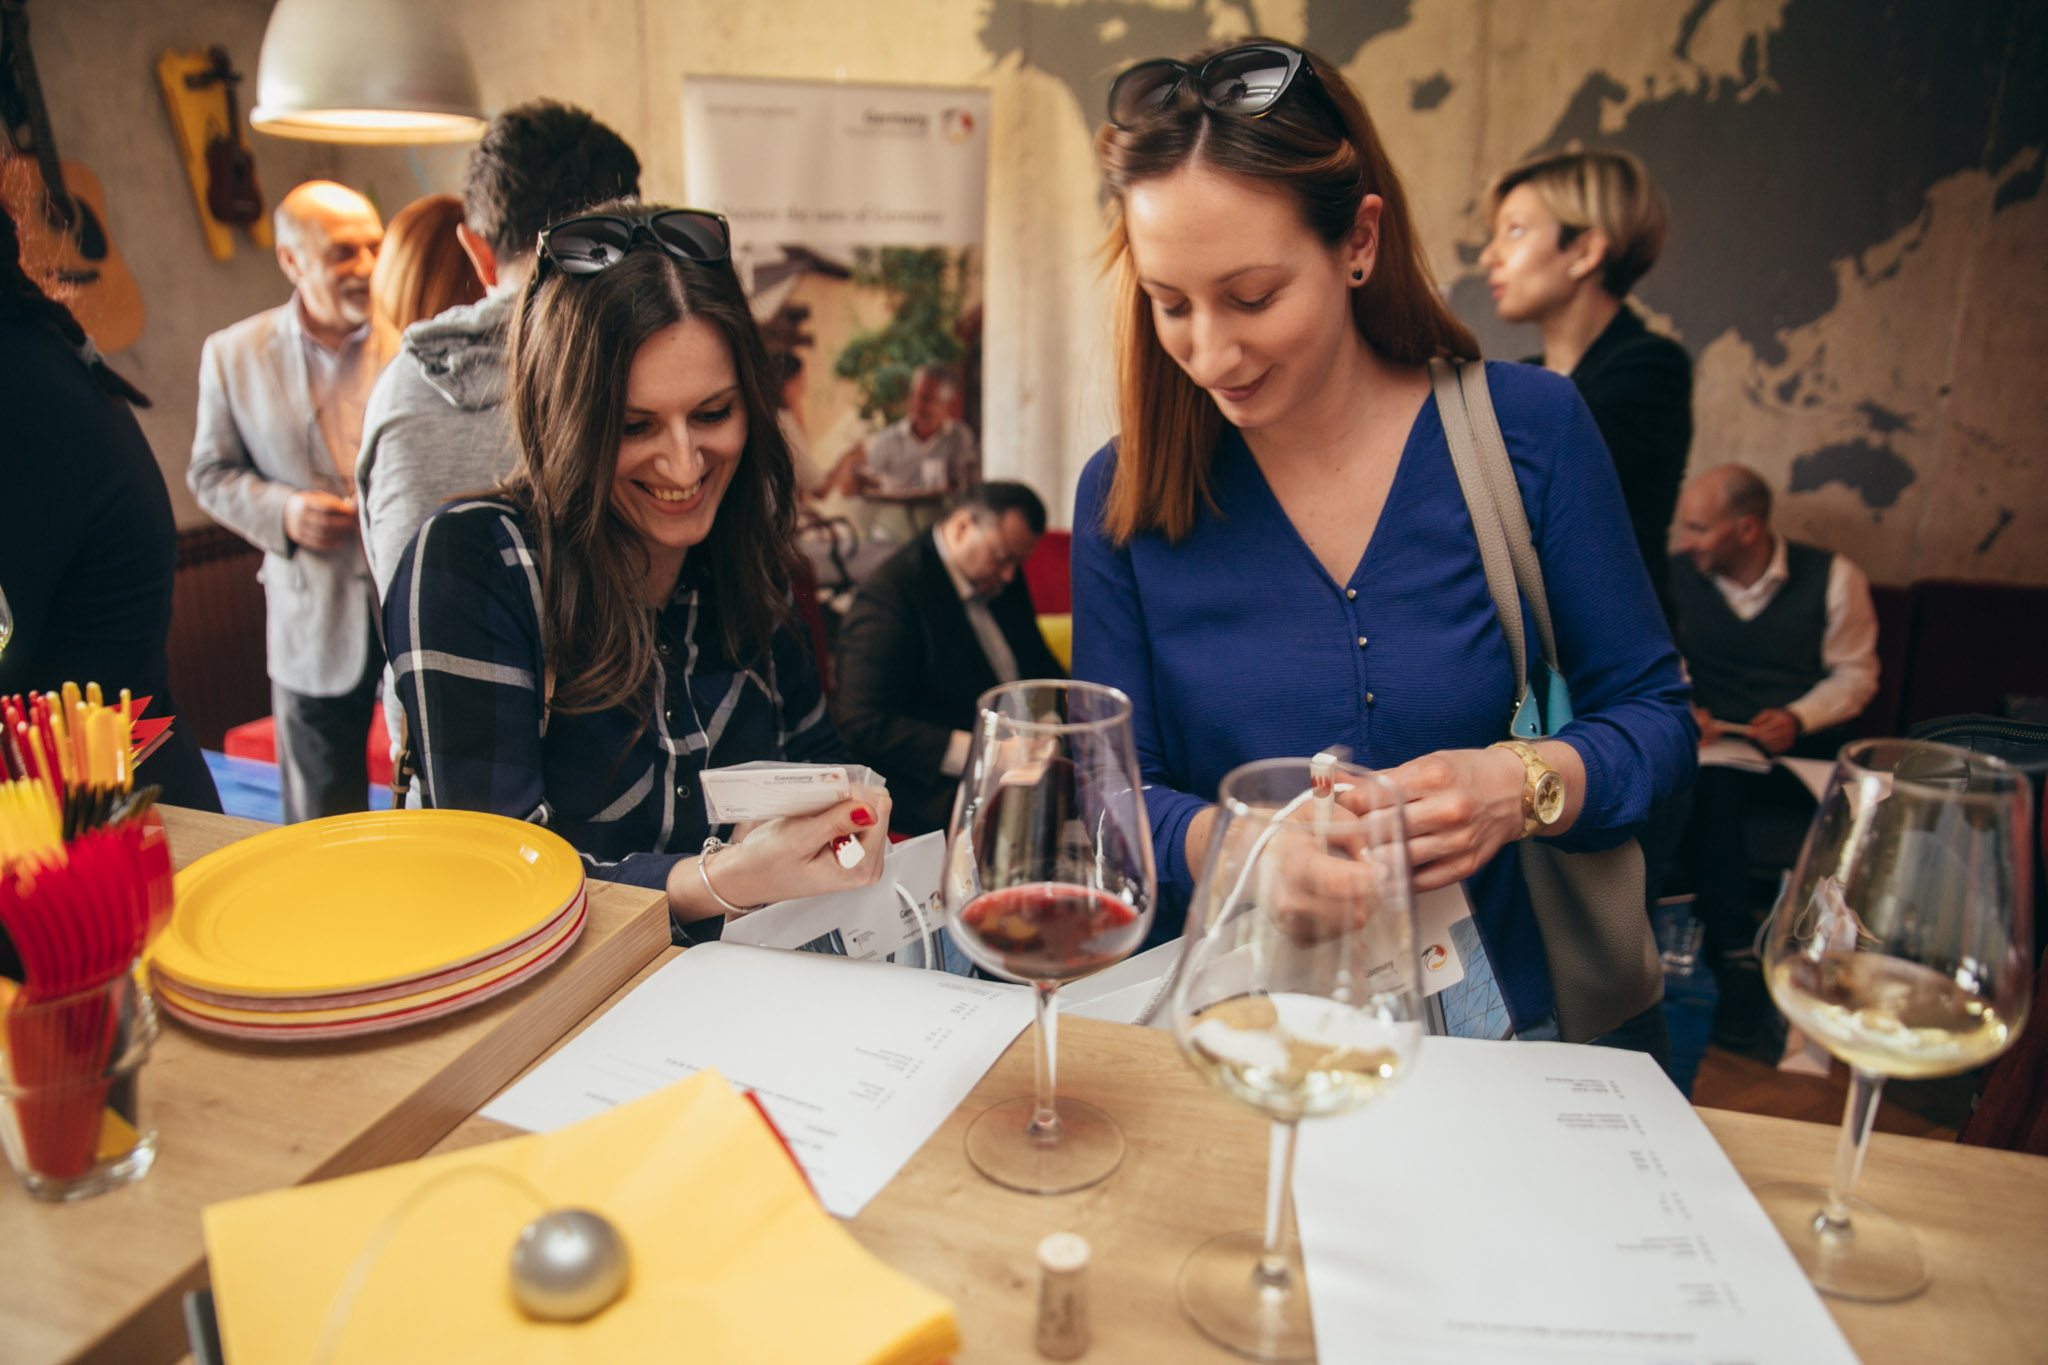 GNTB and LUfthansa B2B quiz in Zagreb